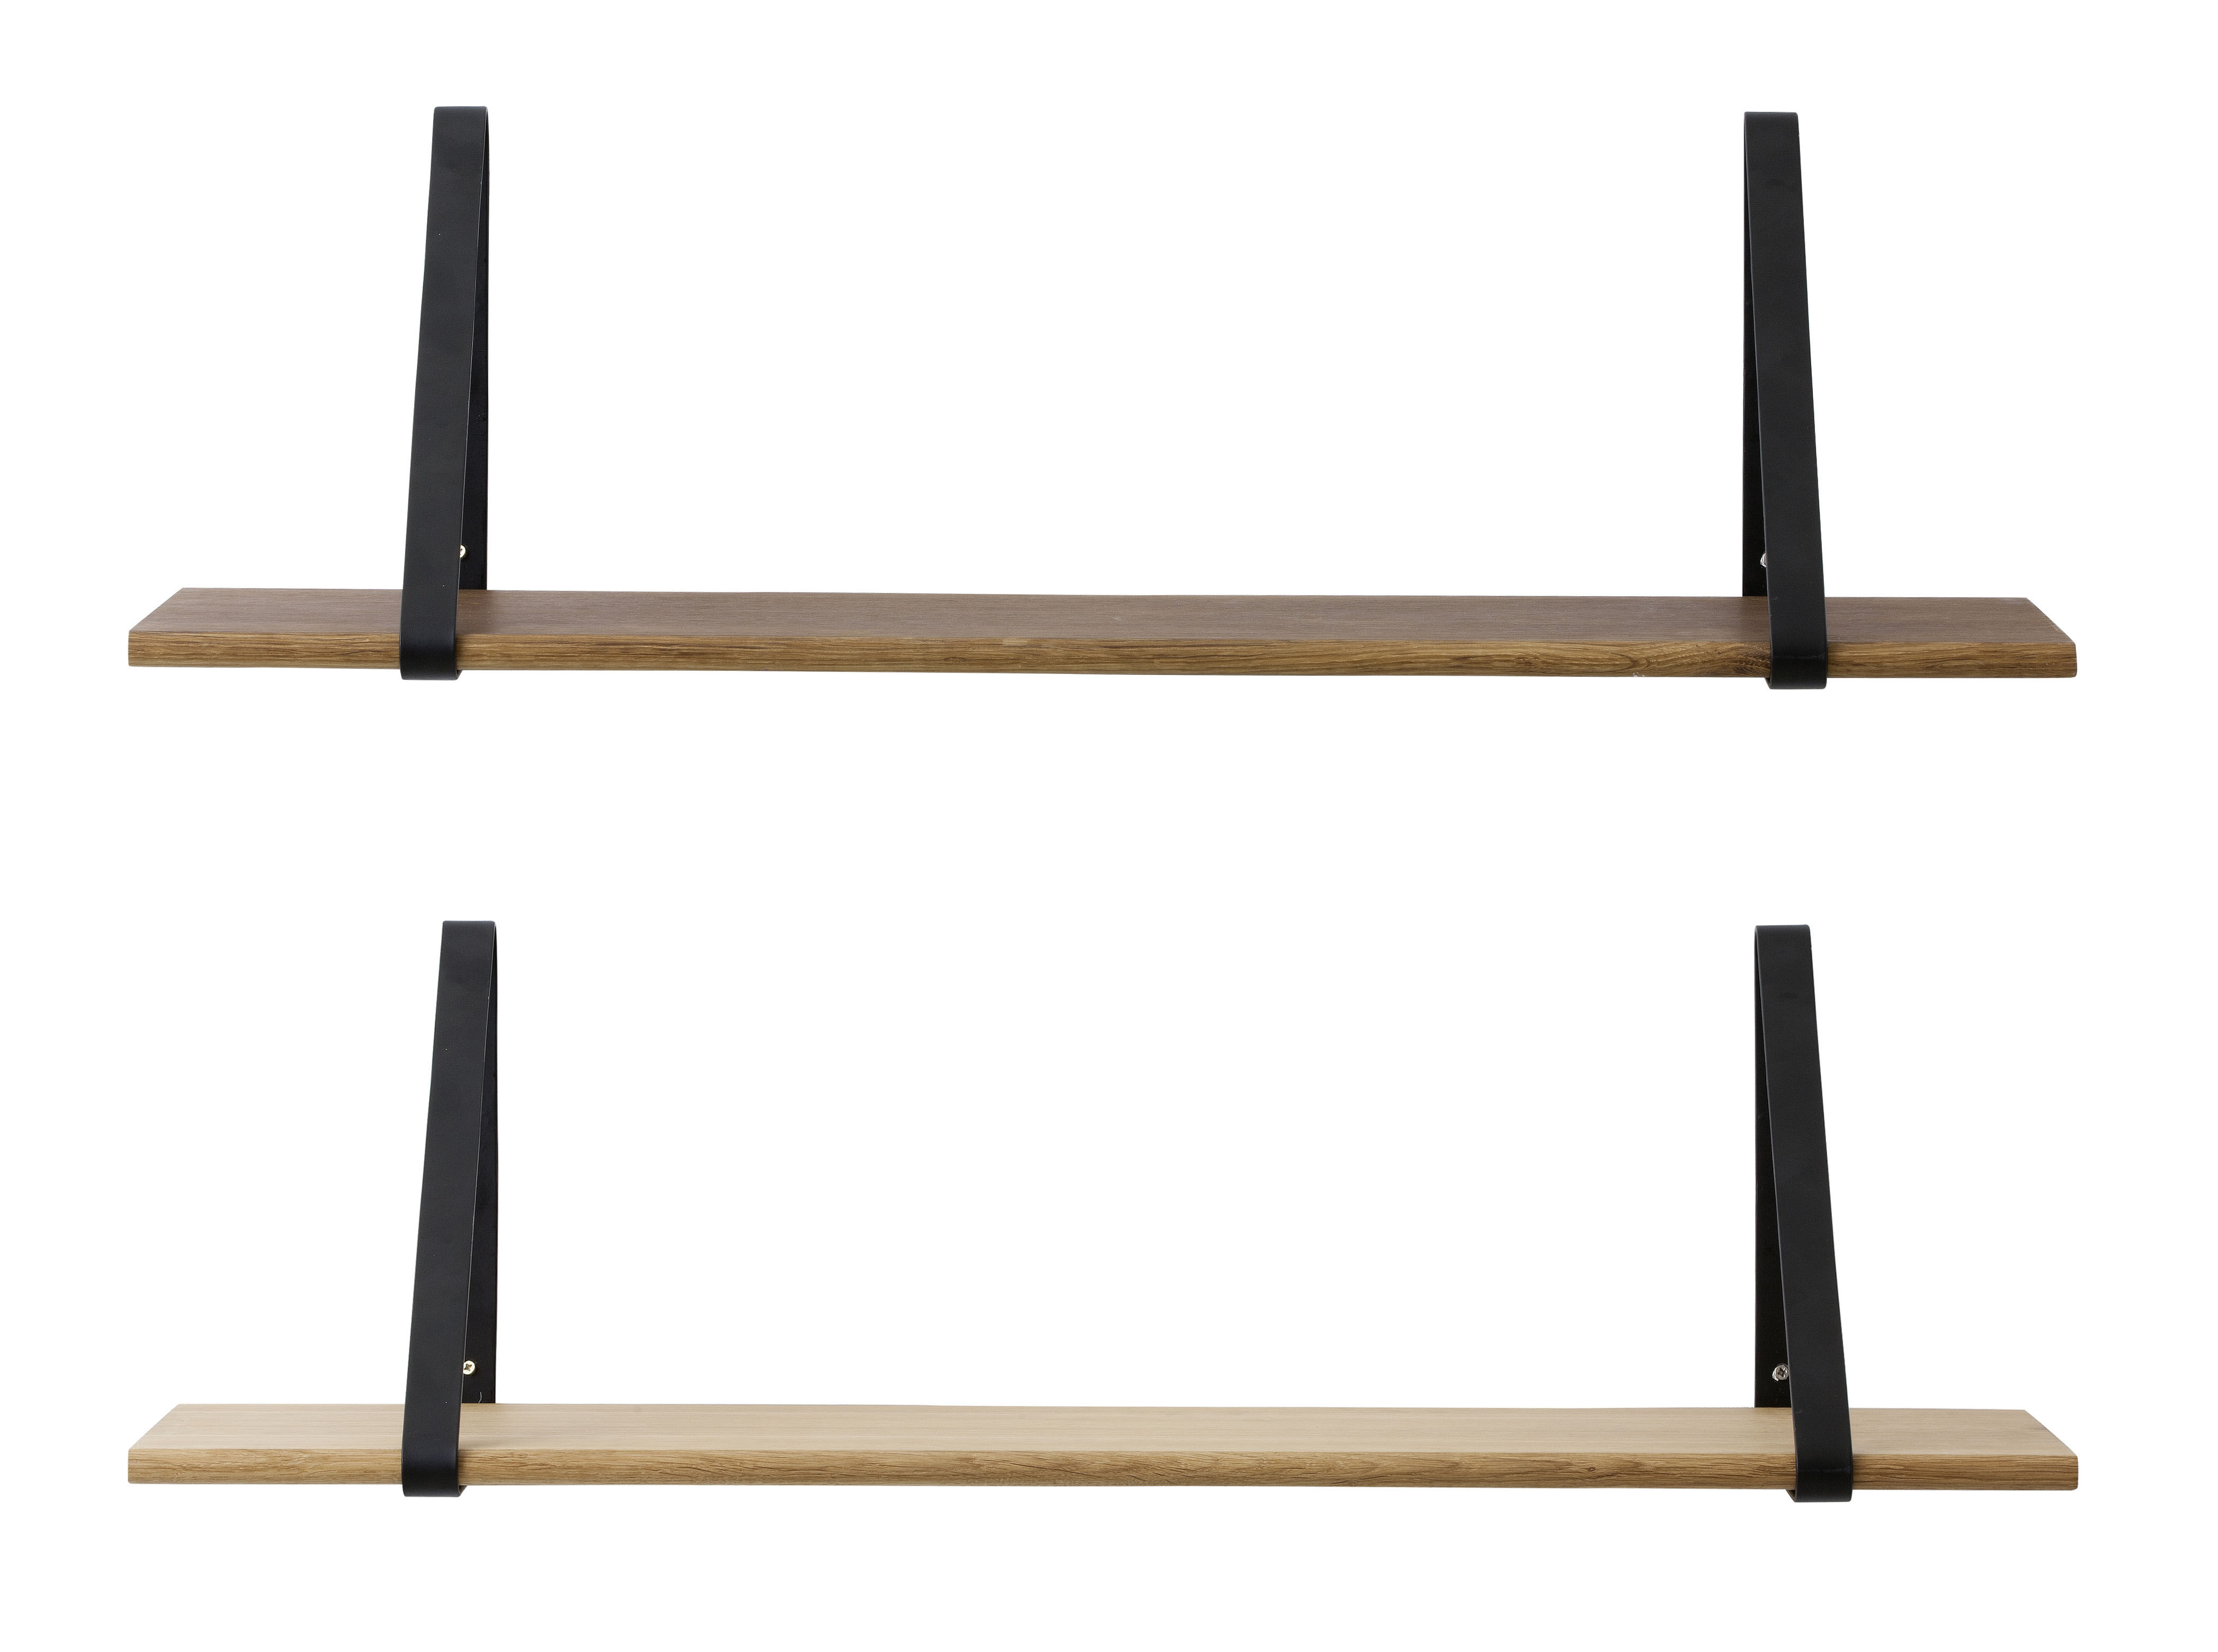 Set Of 2 Shelf Brackets For The Shelf Black By Ferm Living